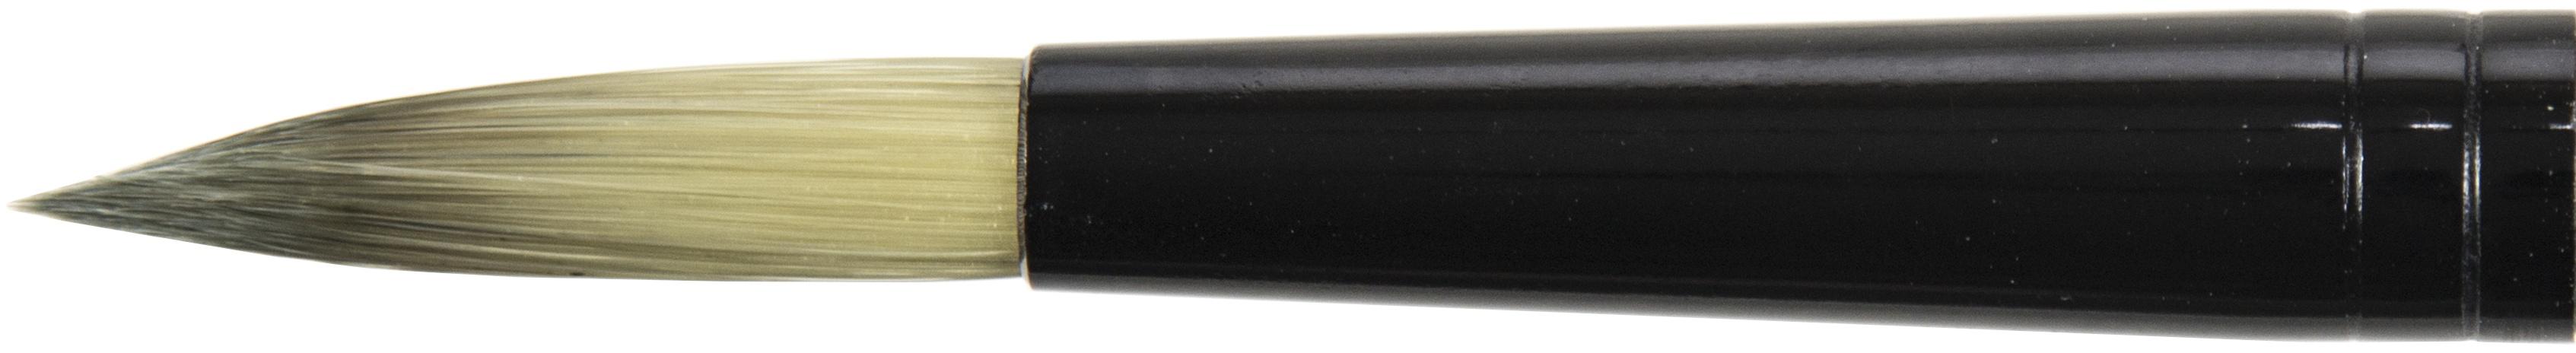 Black Silver Short Handle Brush-Round, Size: 10